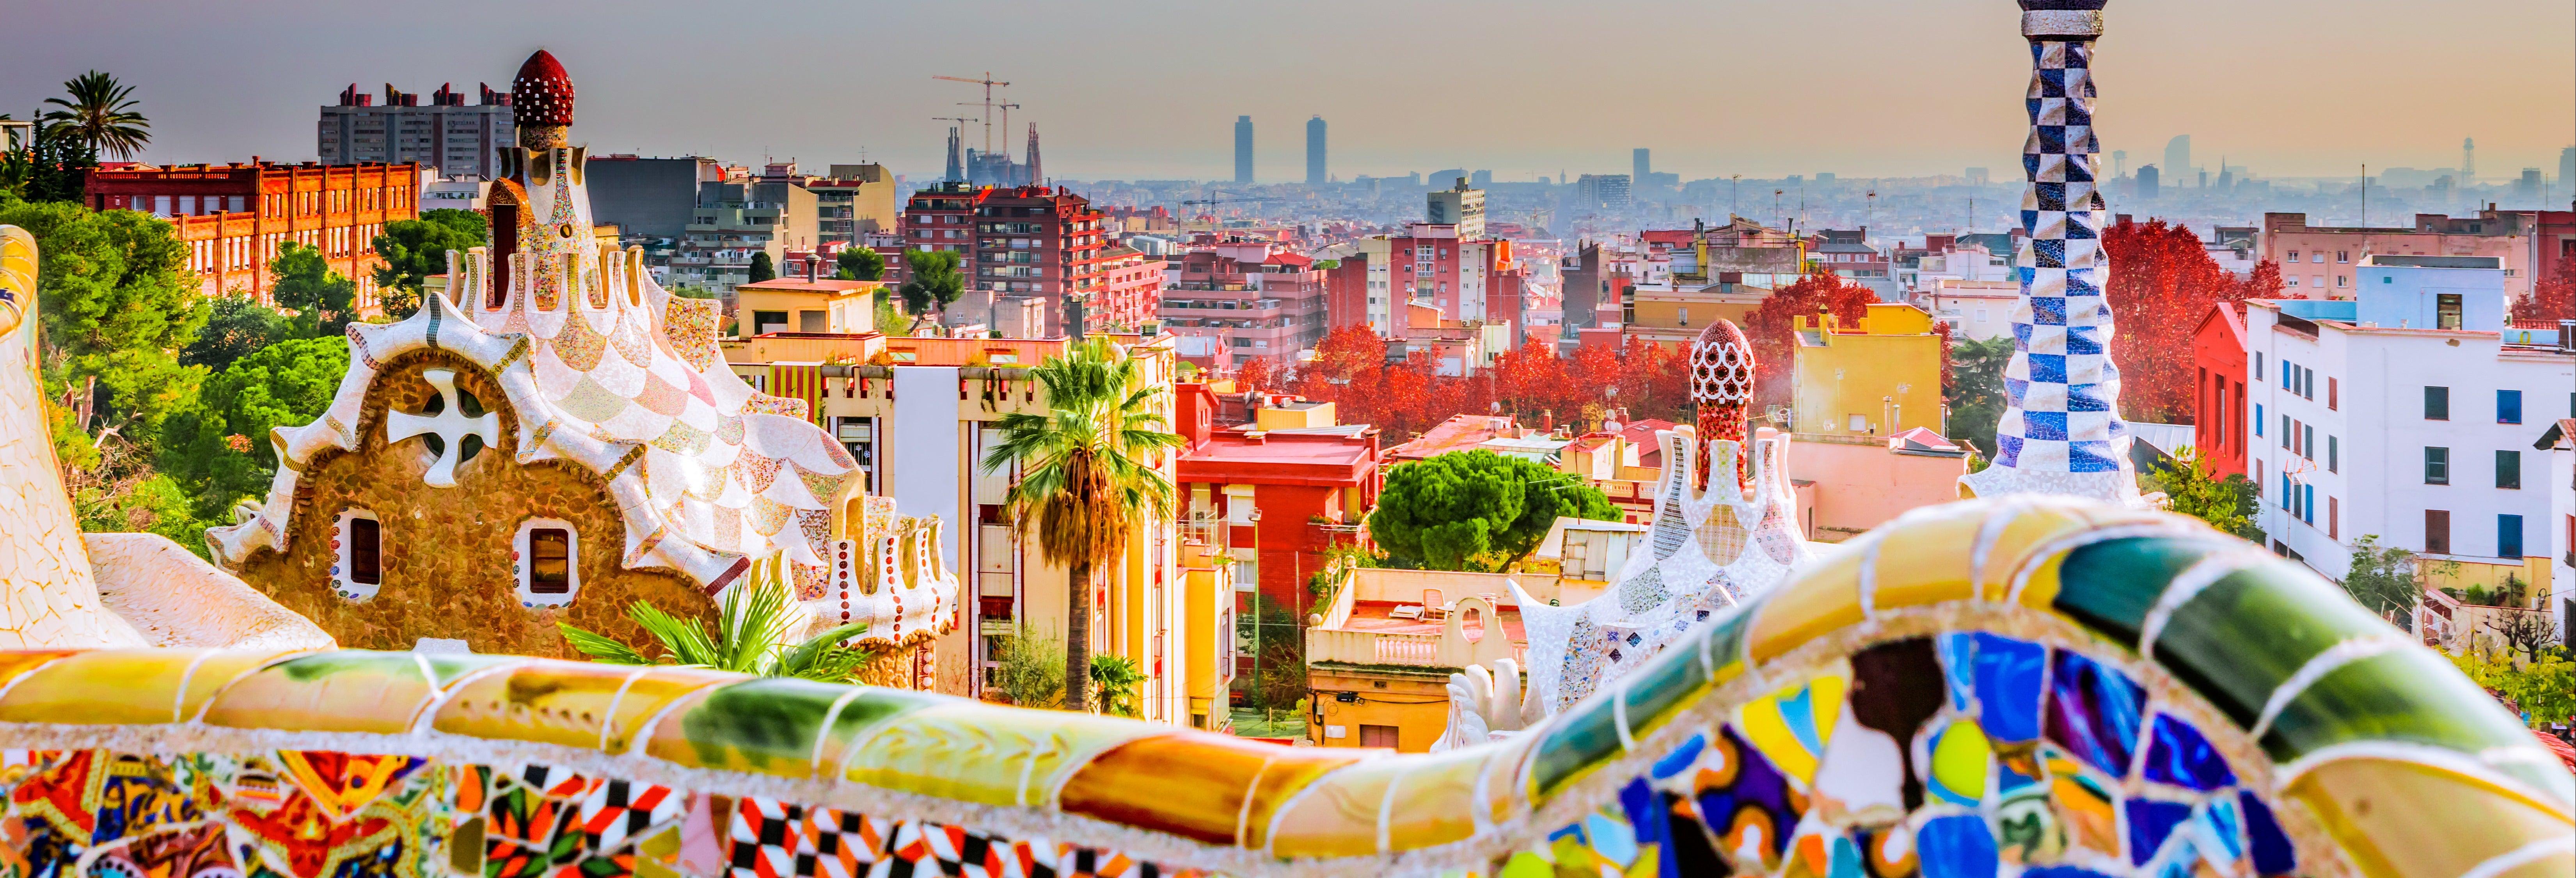 Barcelona Layover Tour